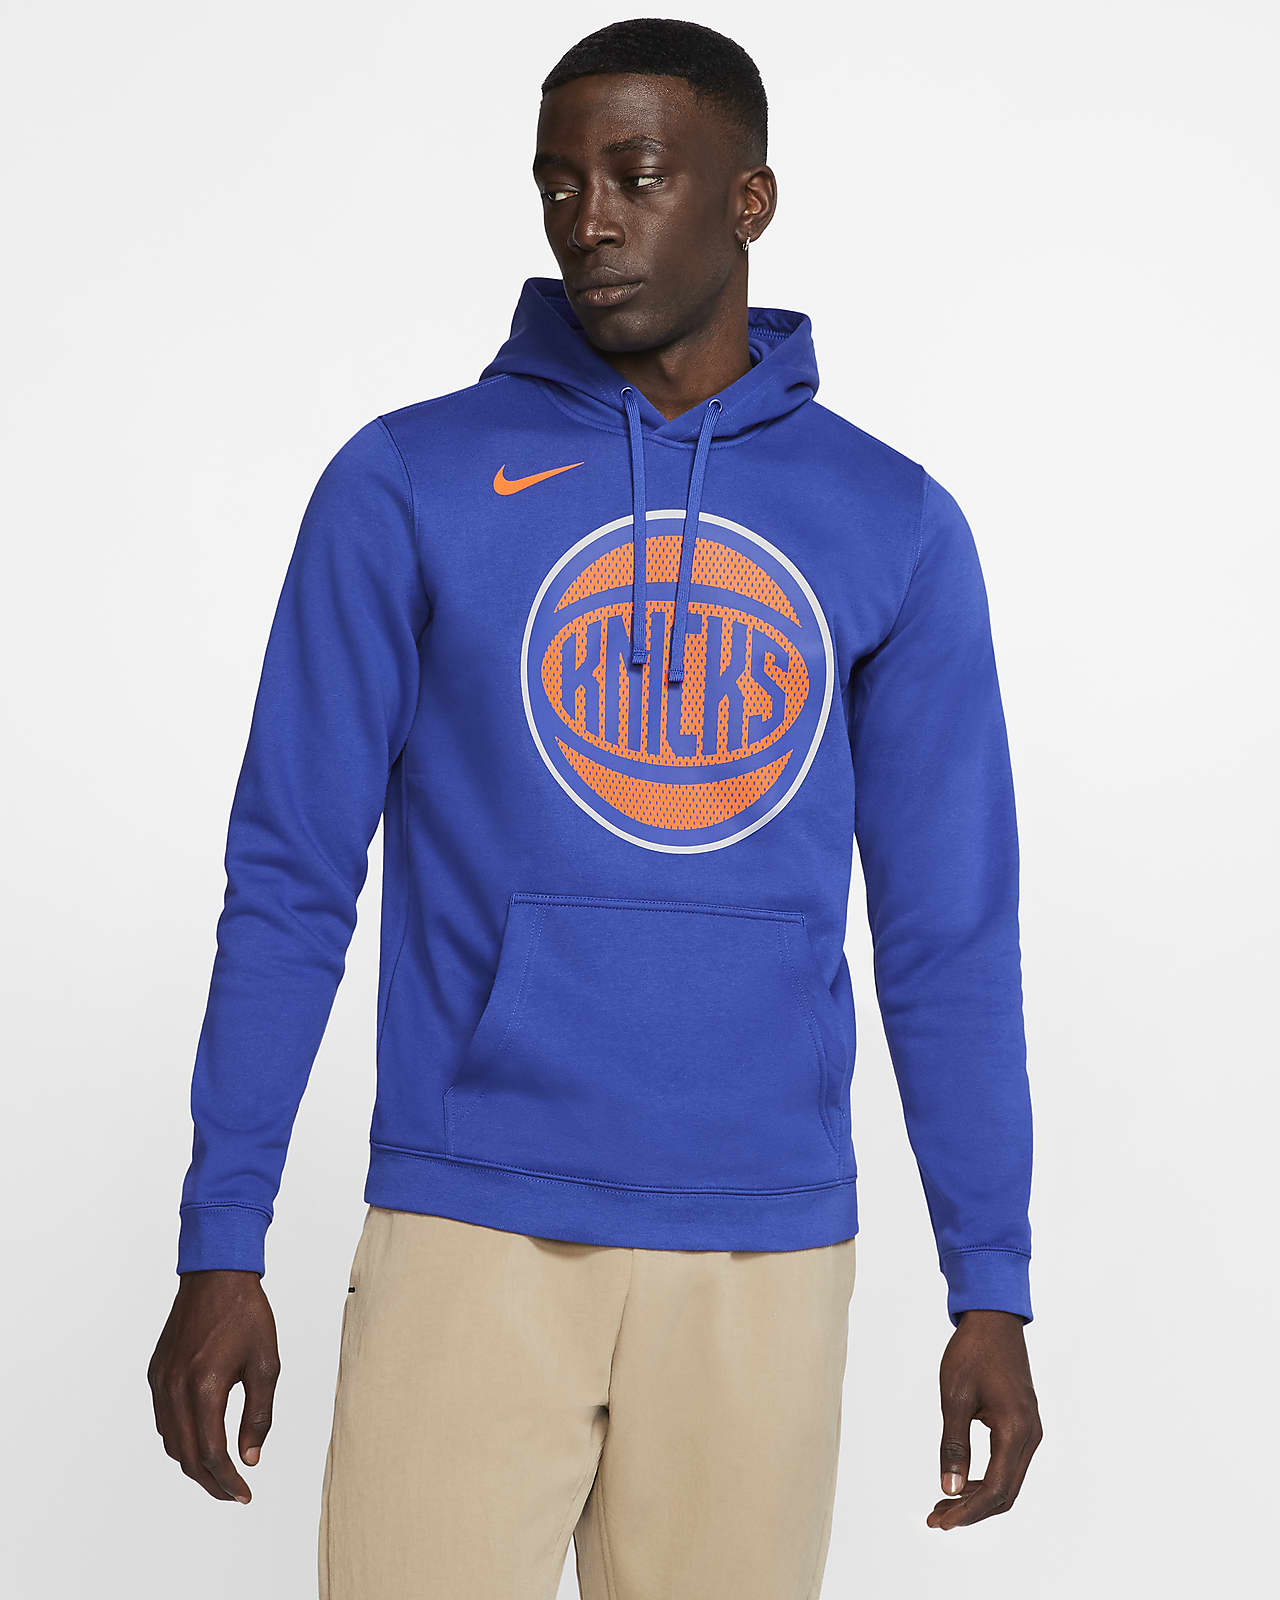 New York Knicks Logo Men's Nike NBA Hoodie